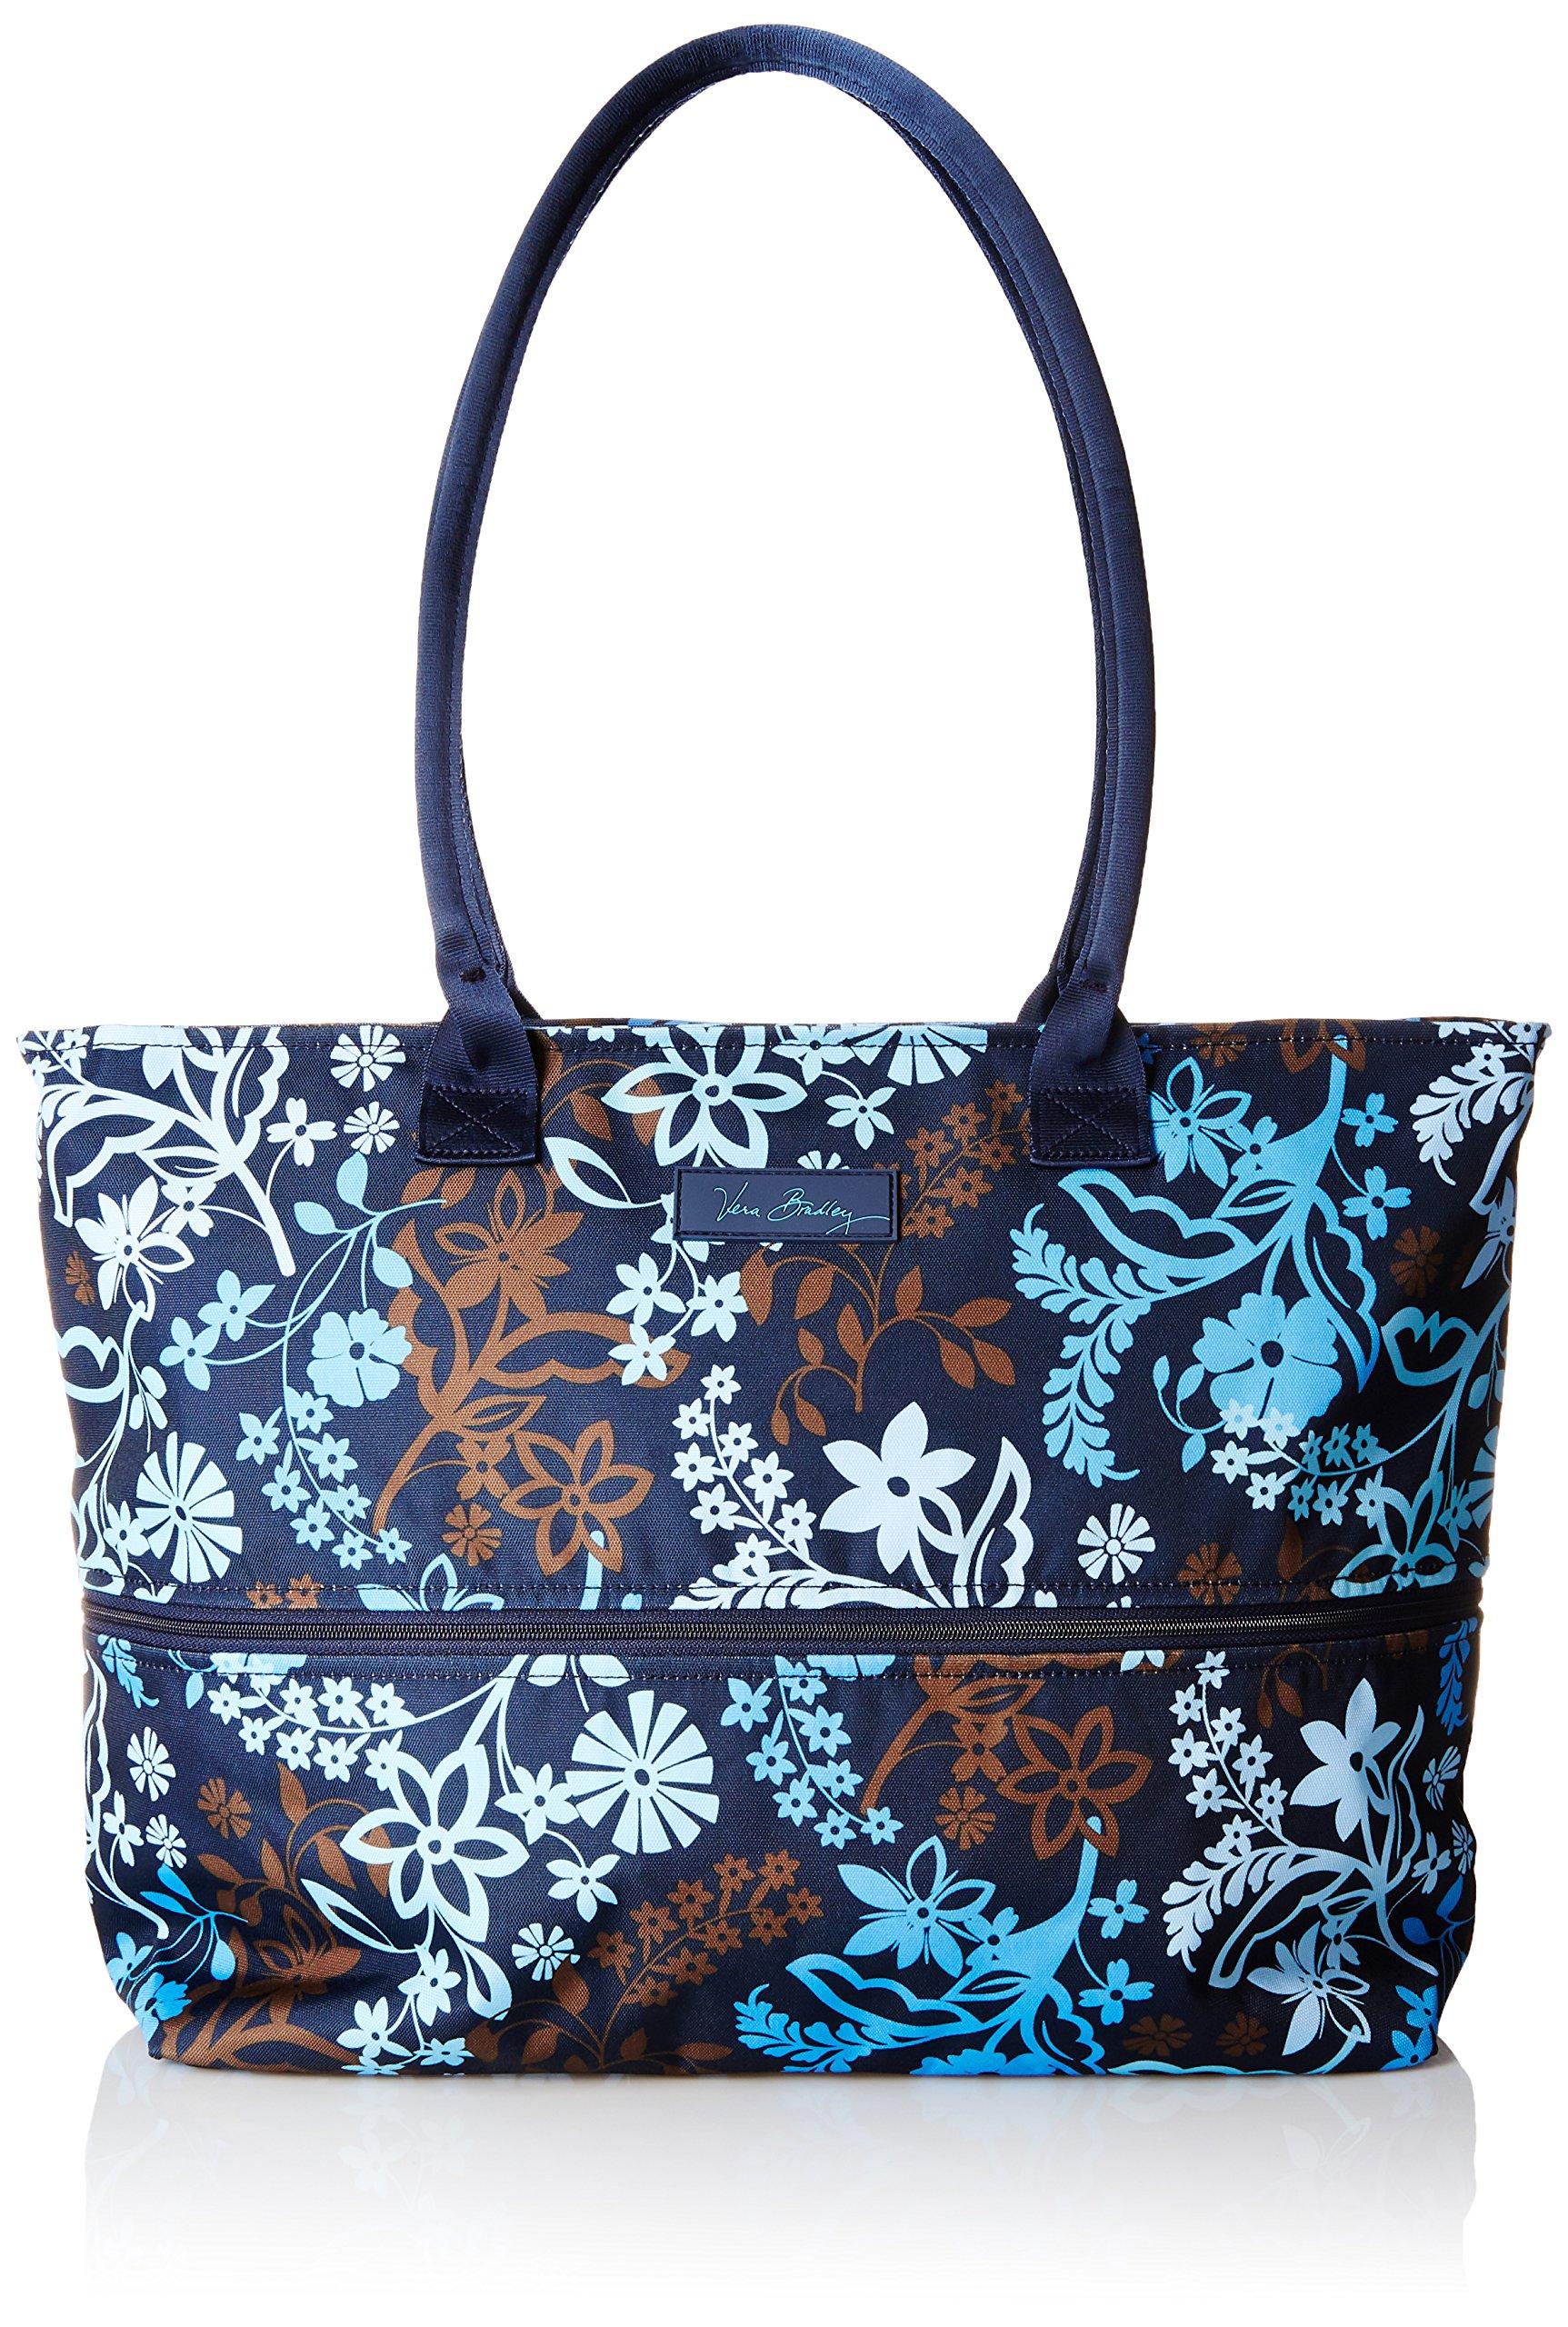 Vera Bradley Women's Lighten up Expandable Travel Tote, Java Floral